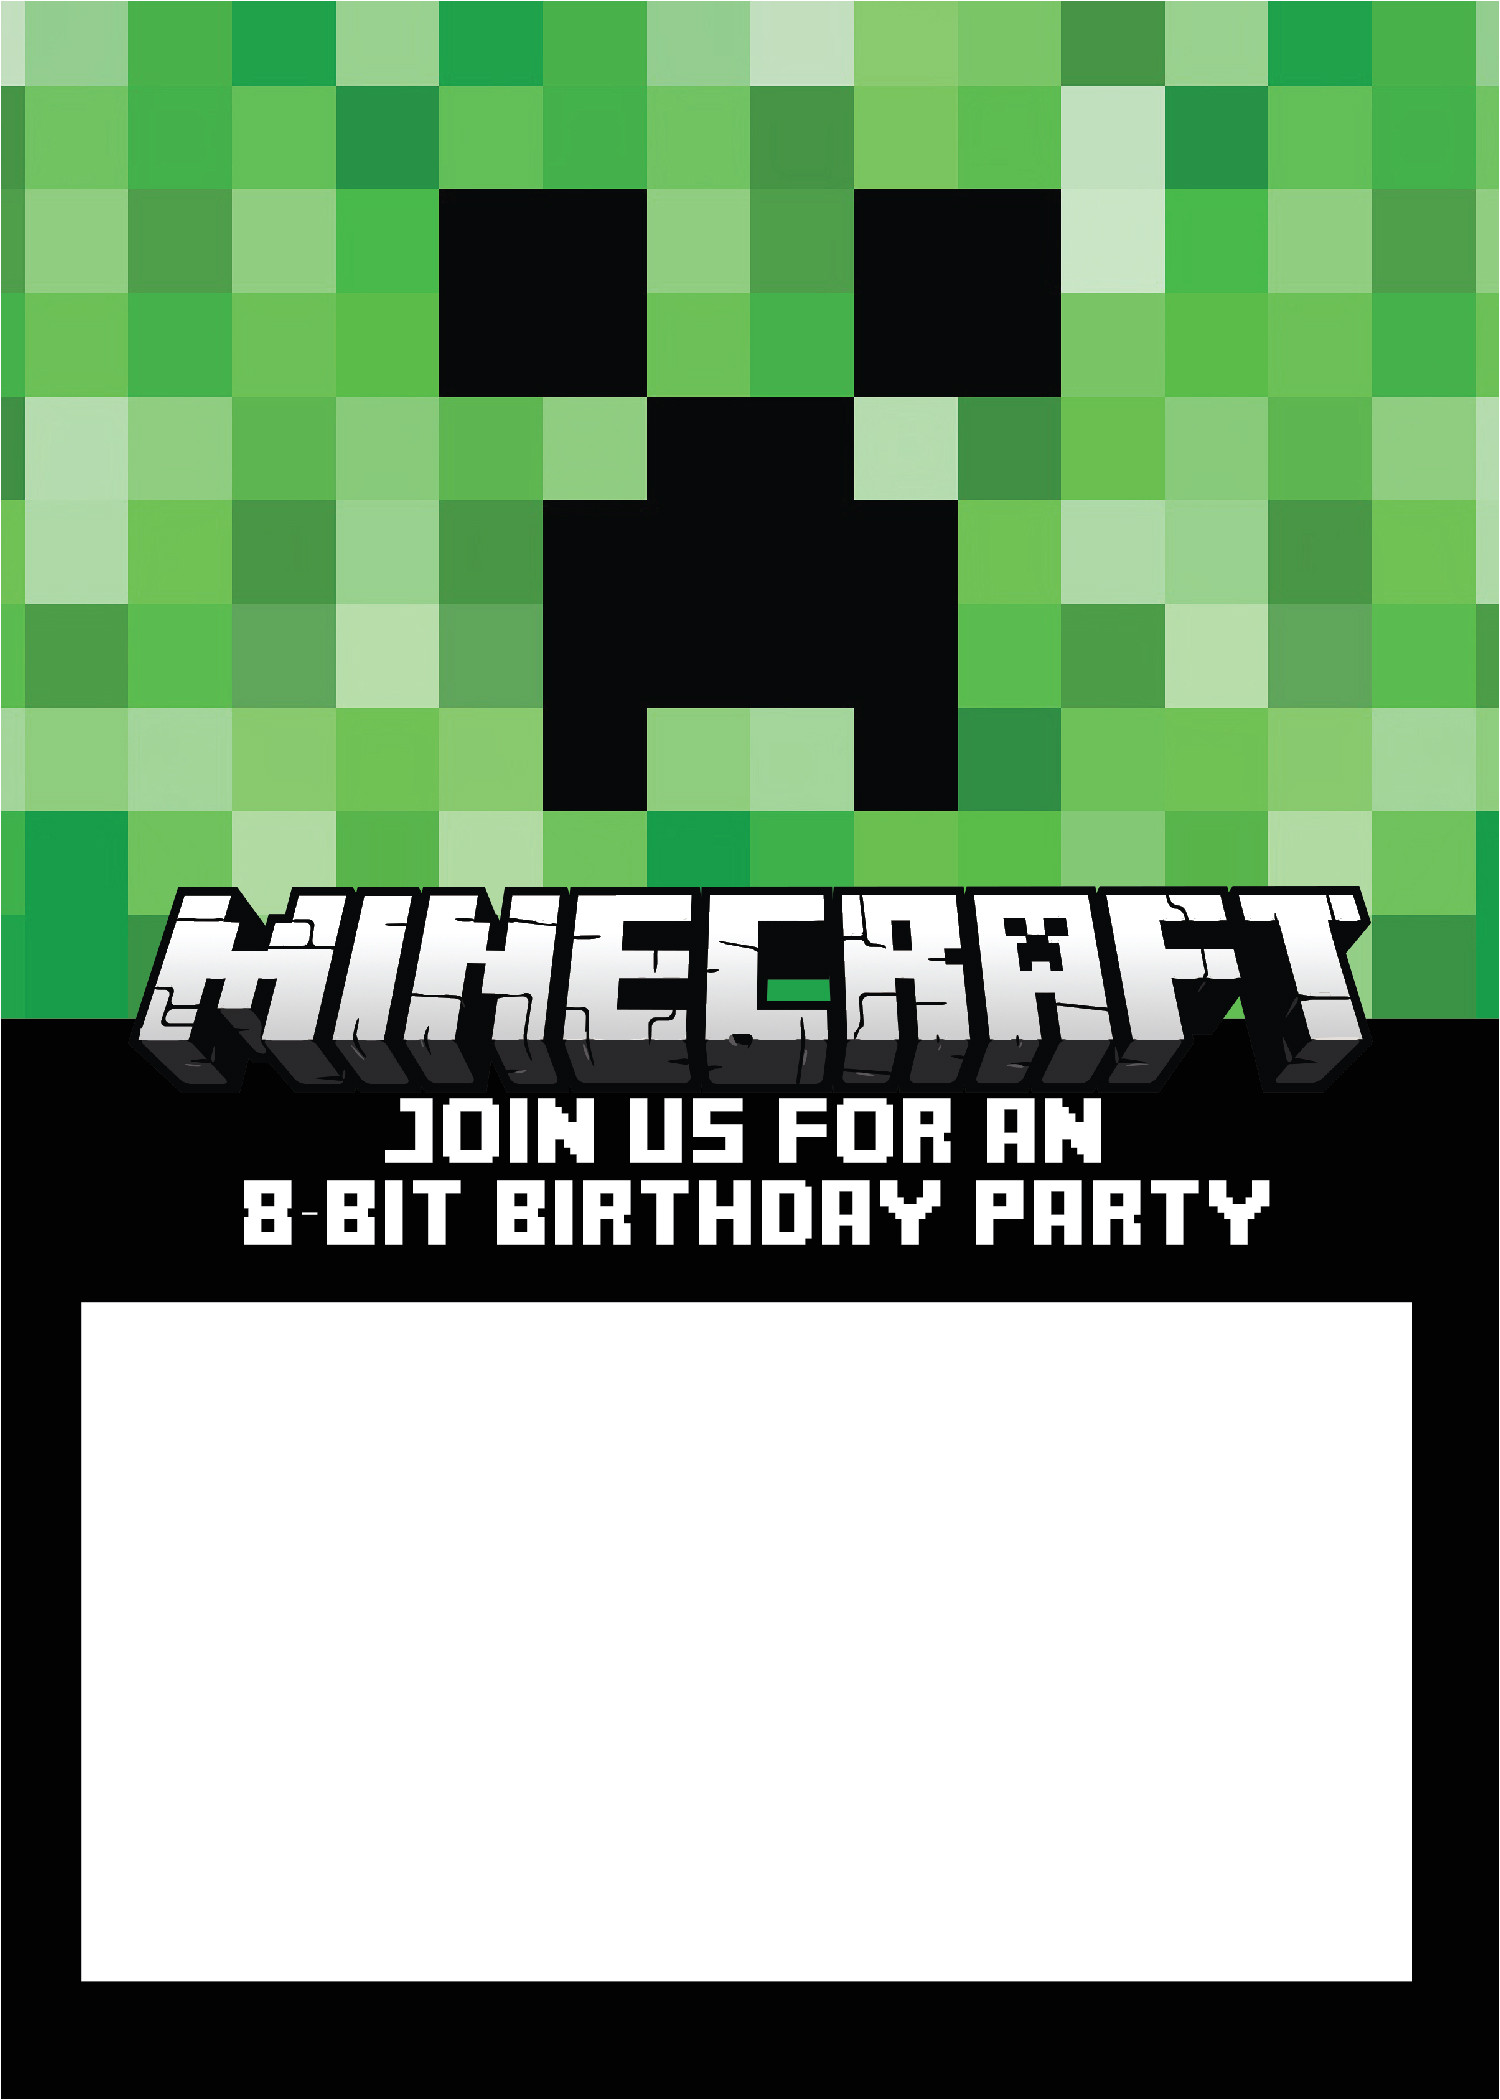 Minecraft Party Invitation Template 40th Birthday Ideas Minecraft Birthday Invitation